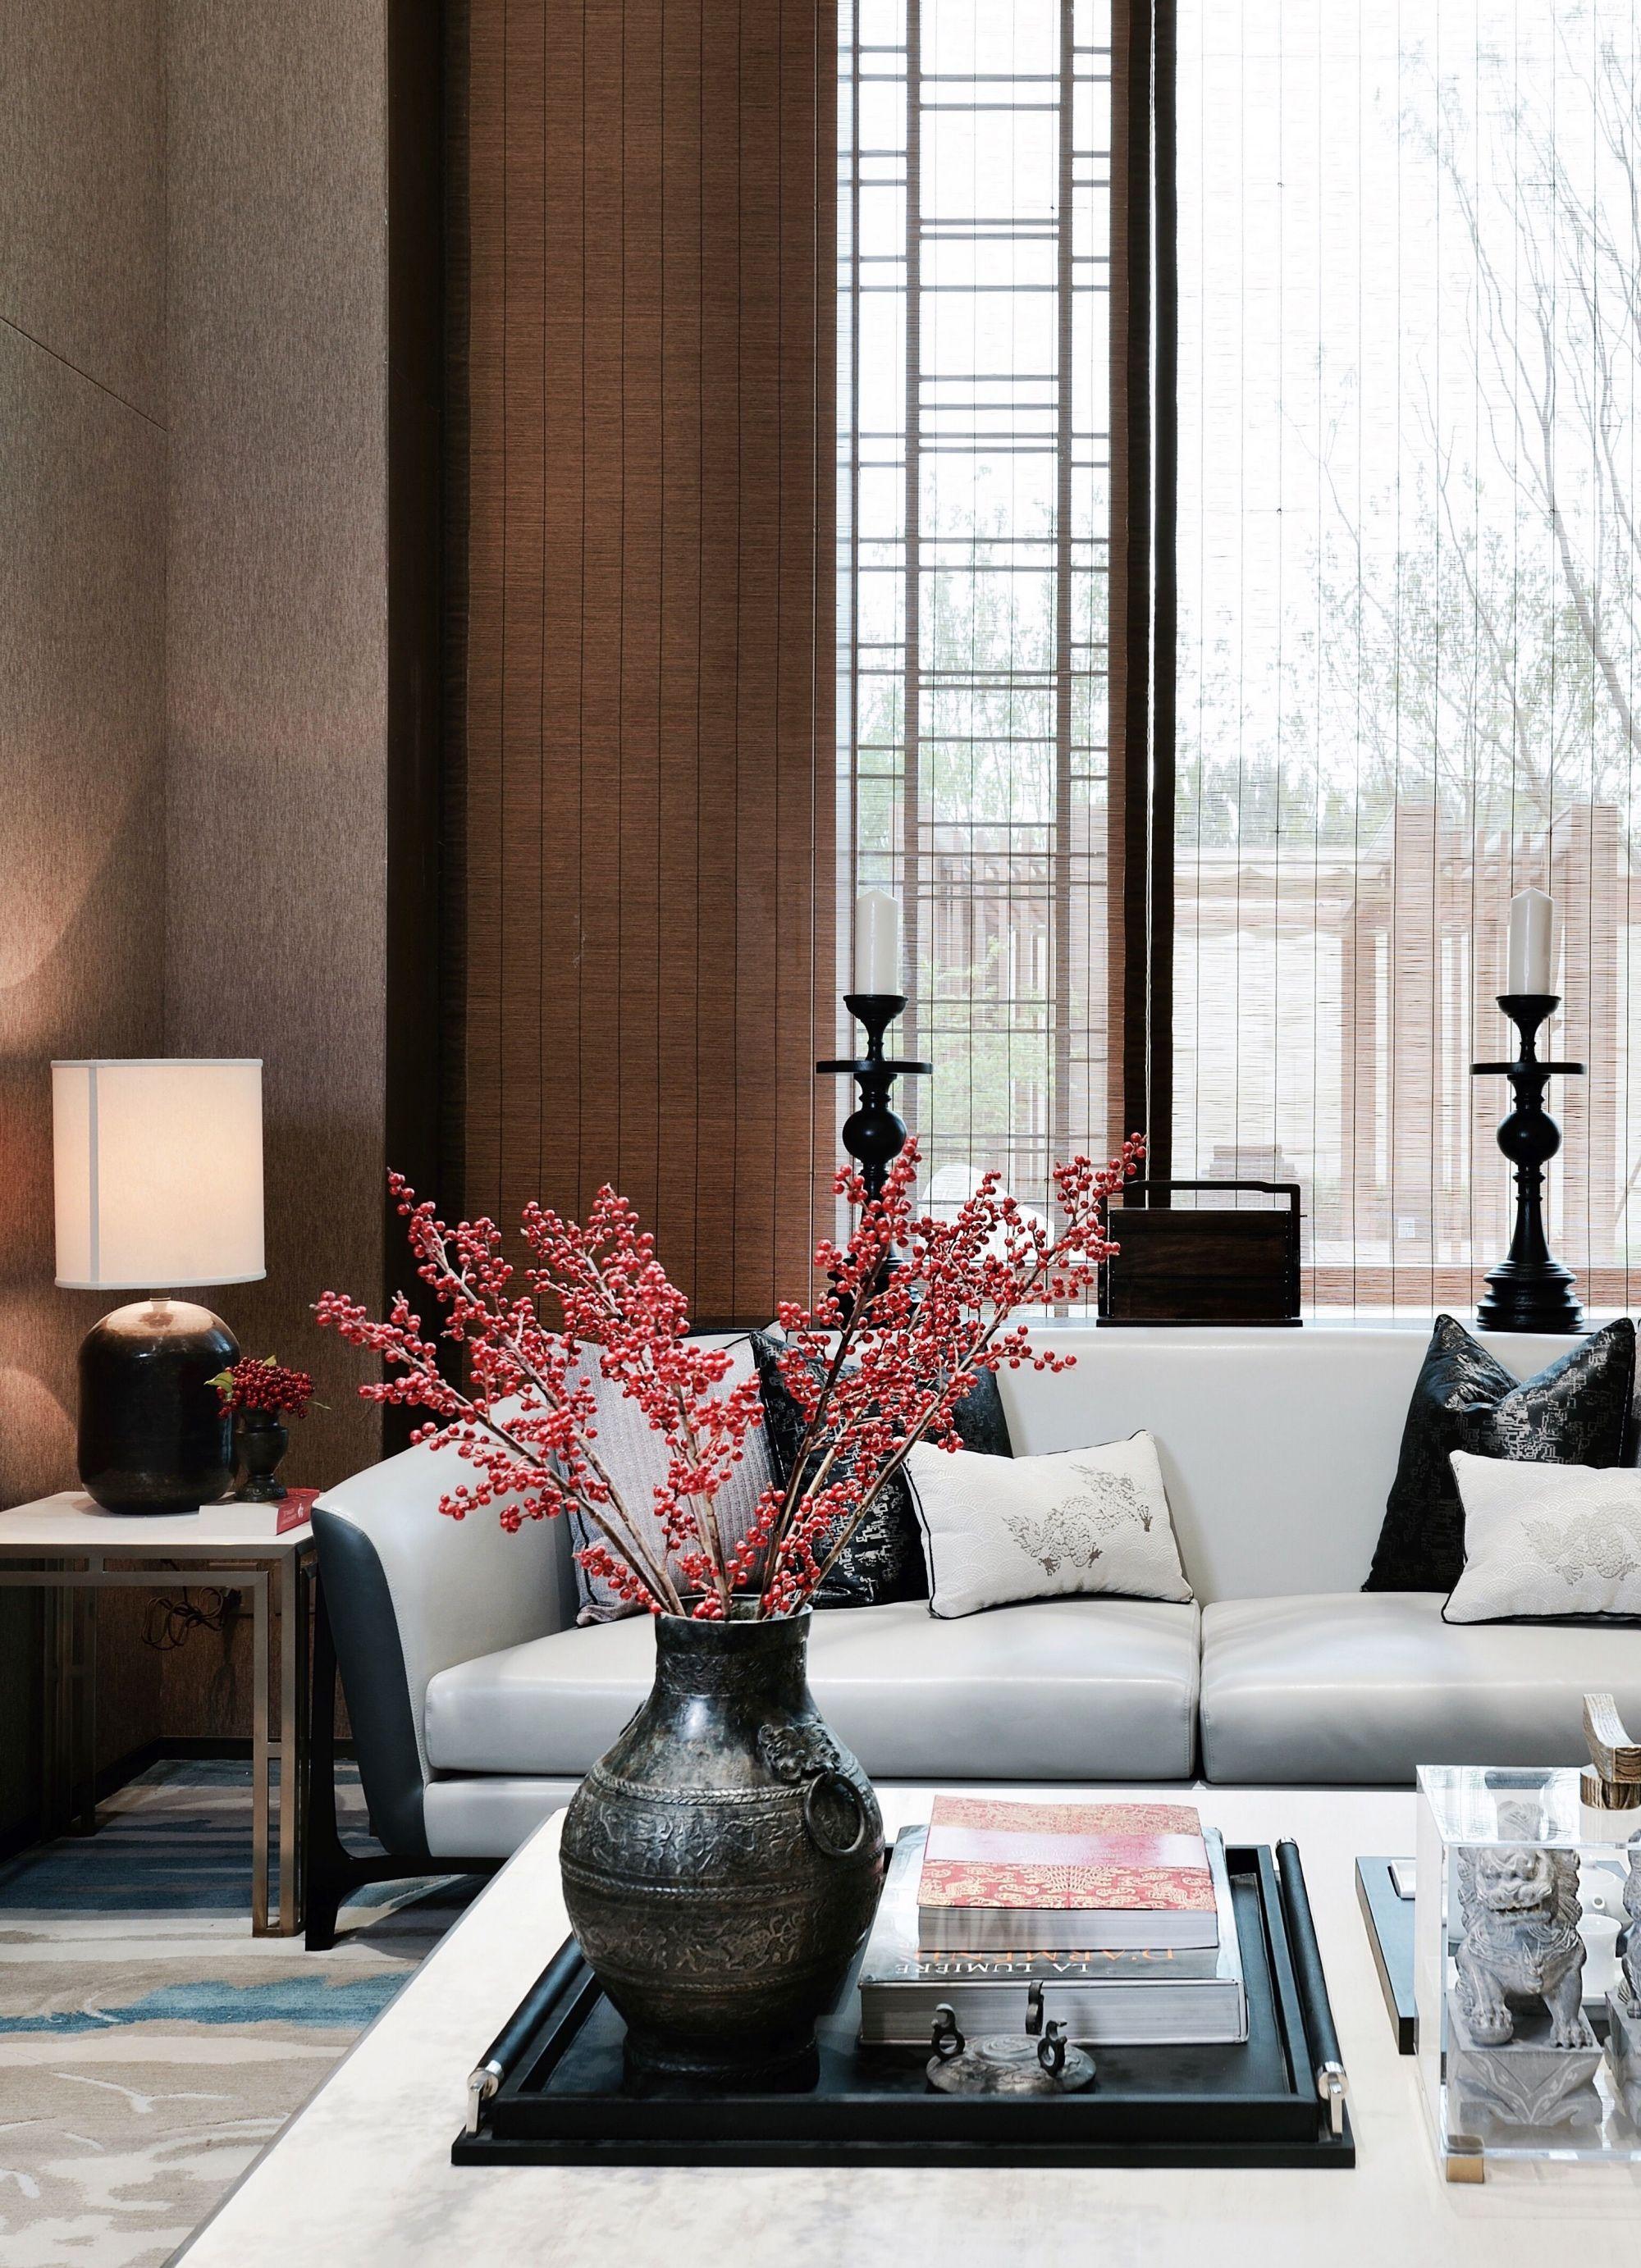 31 Serene Japanese Living Room Décor Ideas - DigsDigs